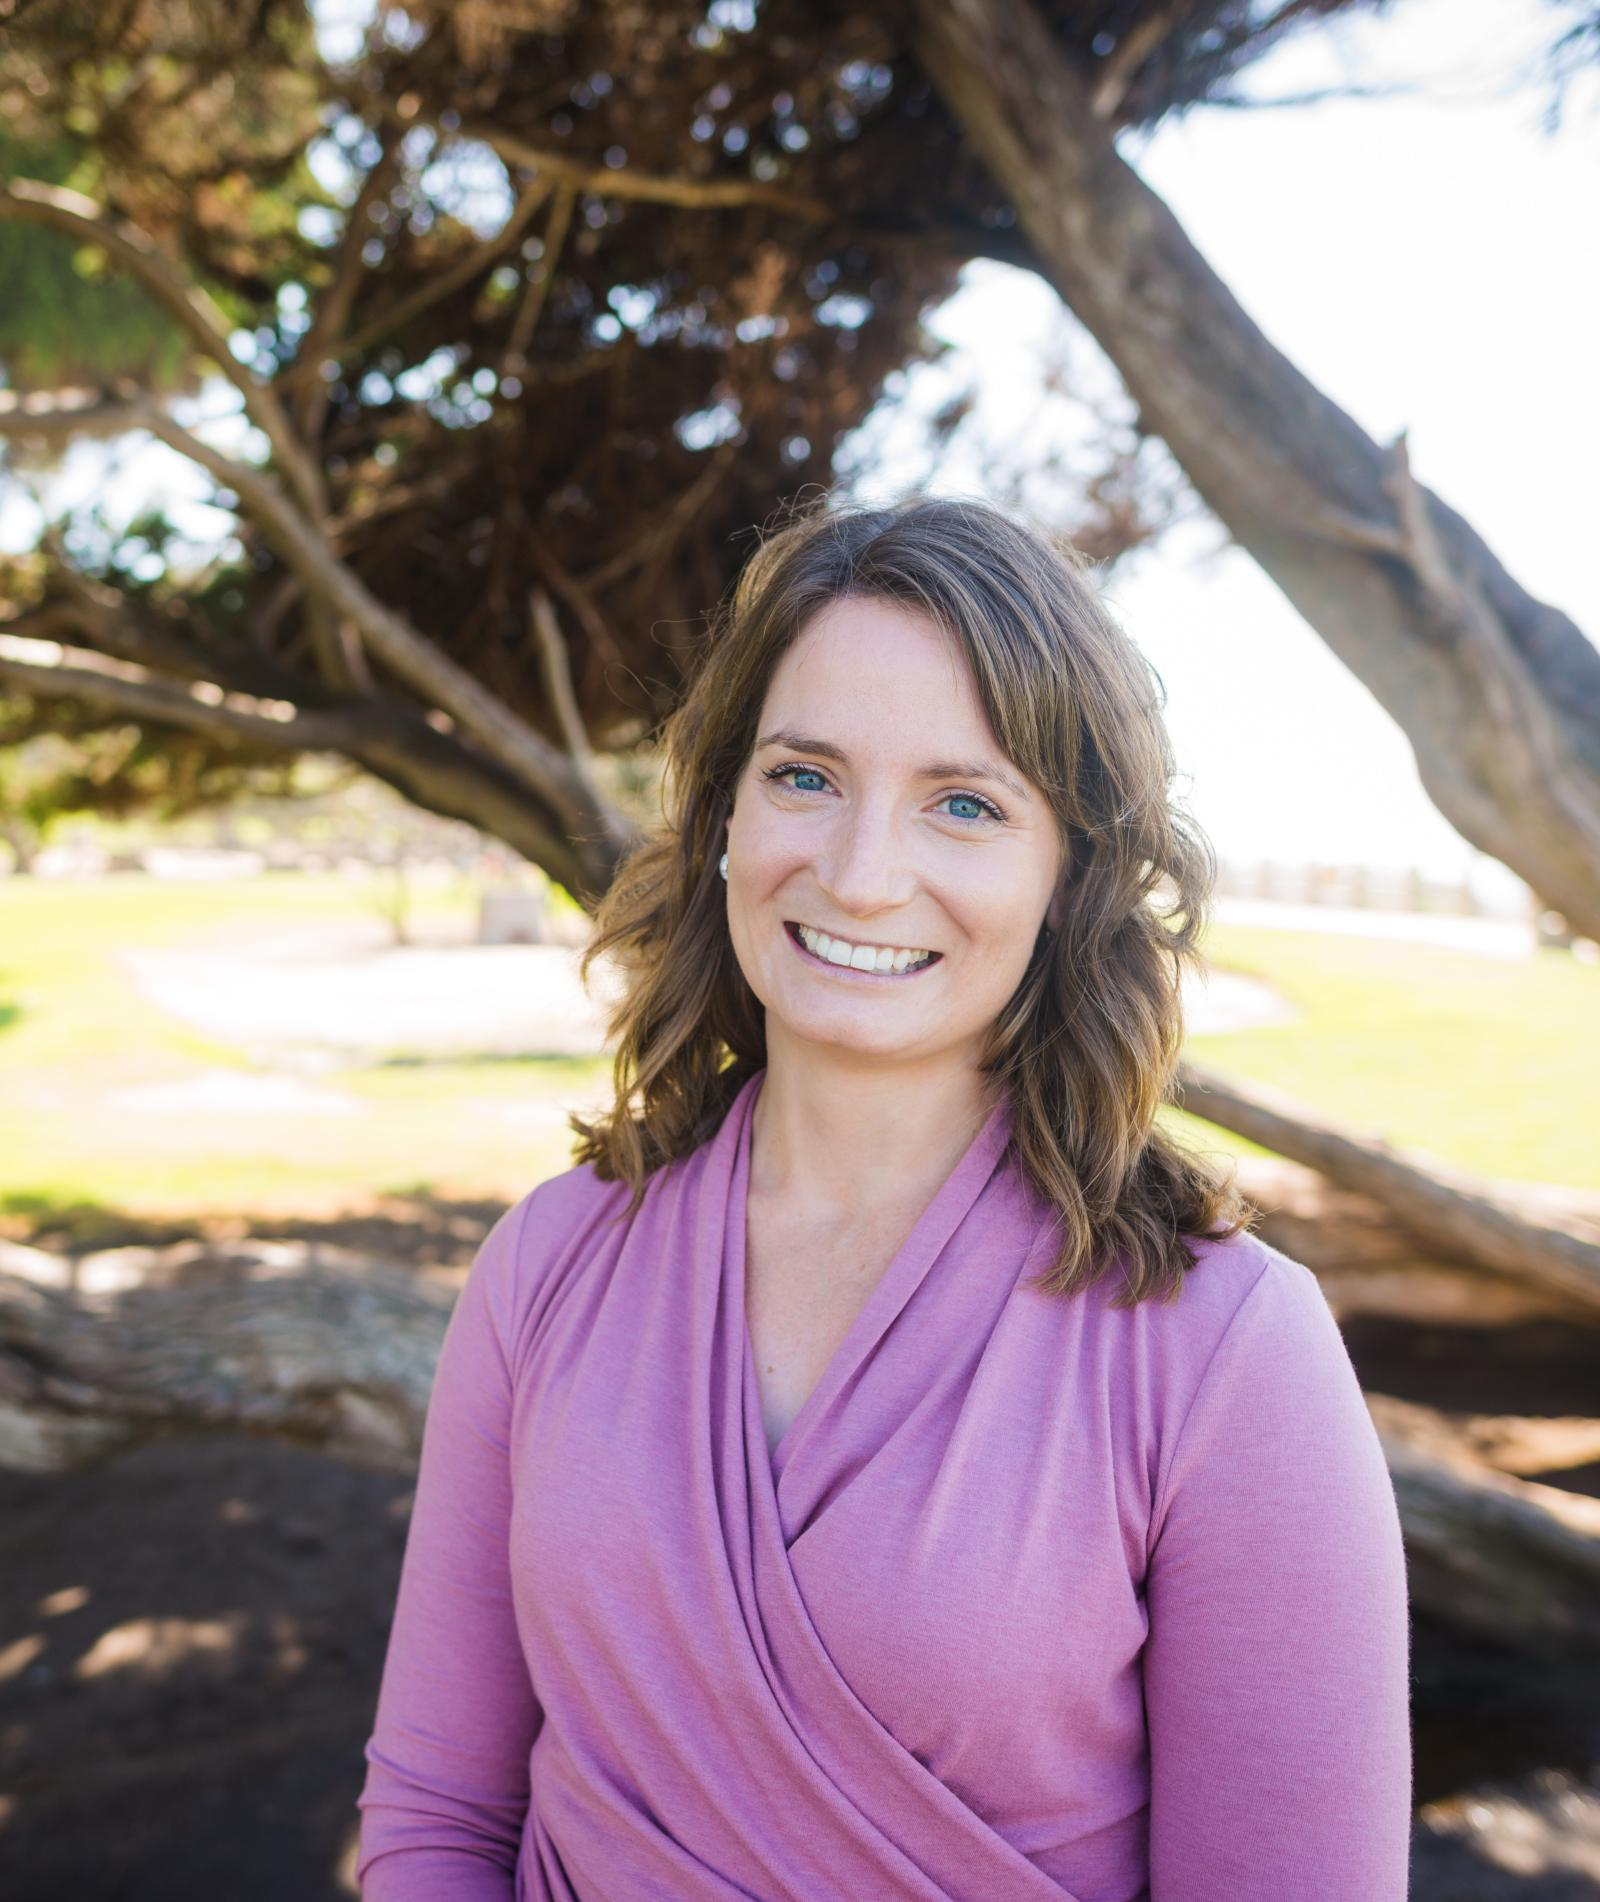 Meet Dr. Lindsay Bancroft